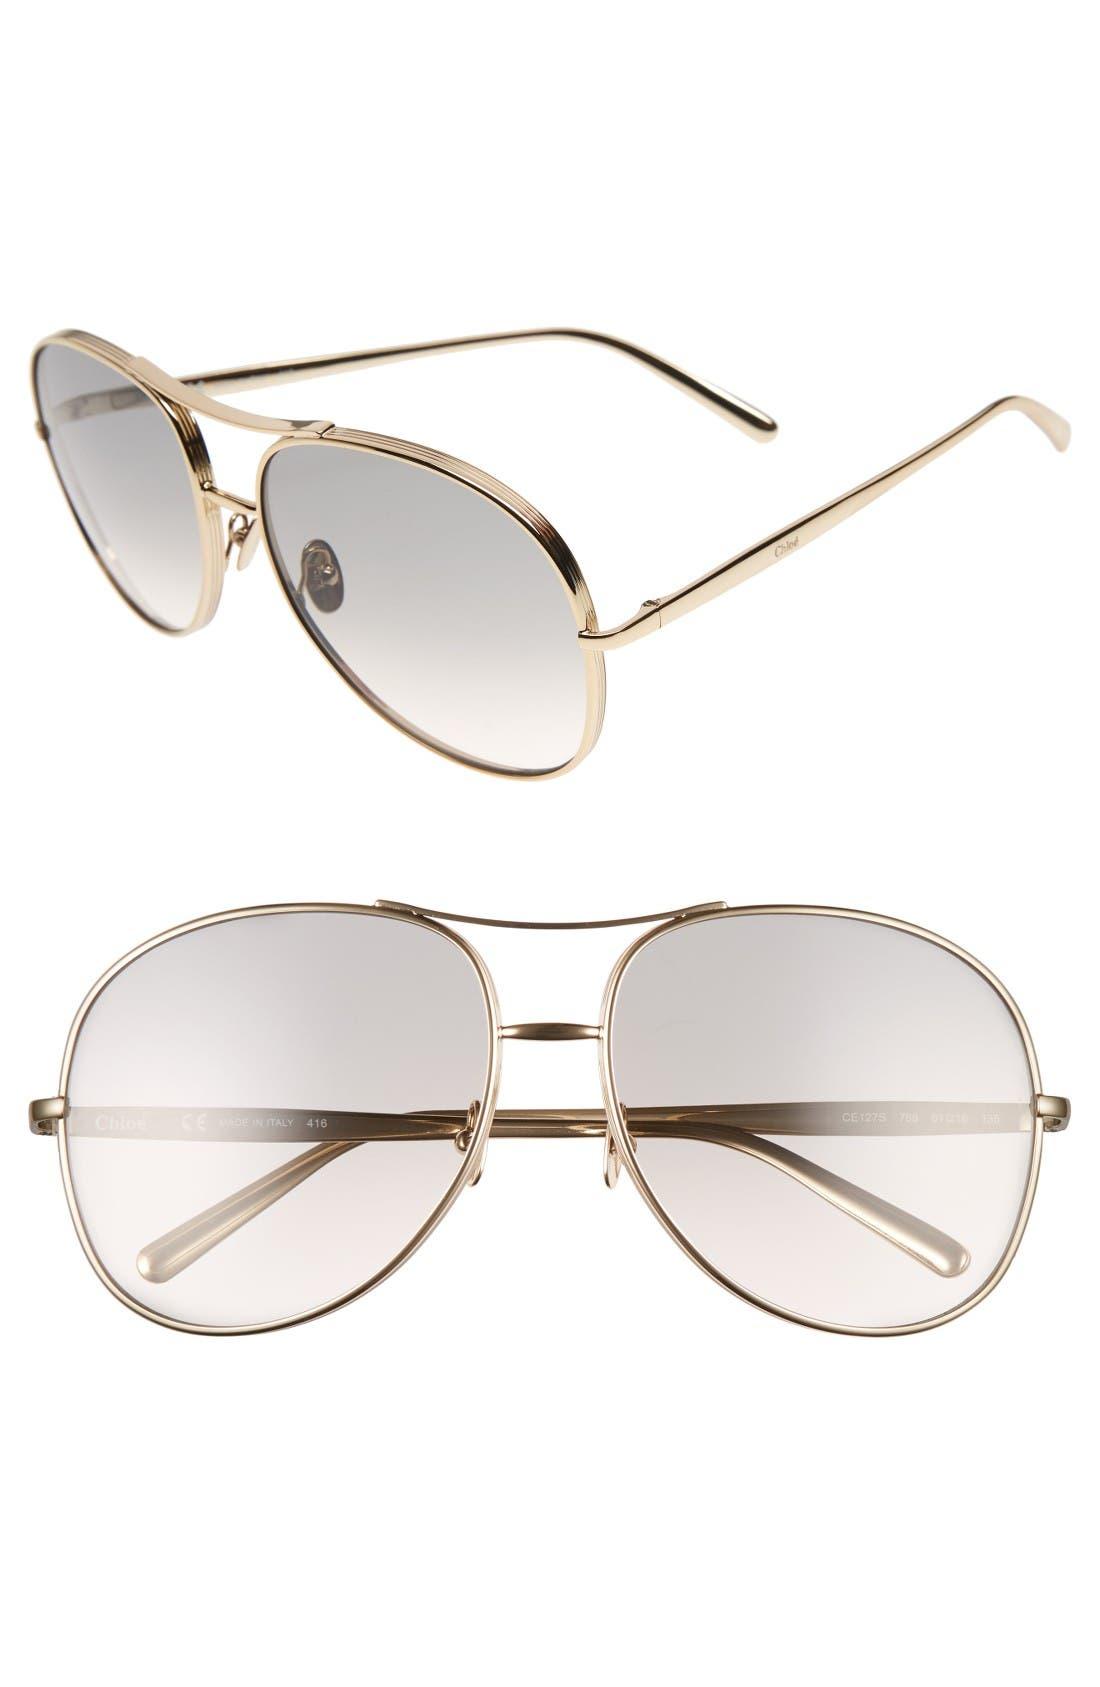 61mm Oversize Sunglasses,                         Main,                         color, Gold/ Light Grey